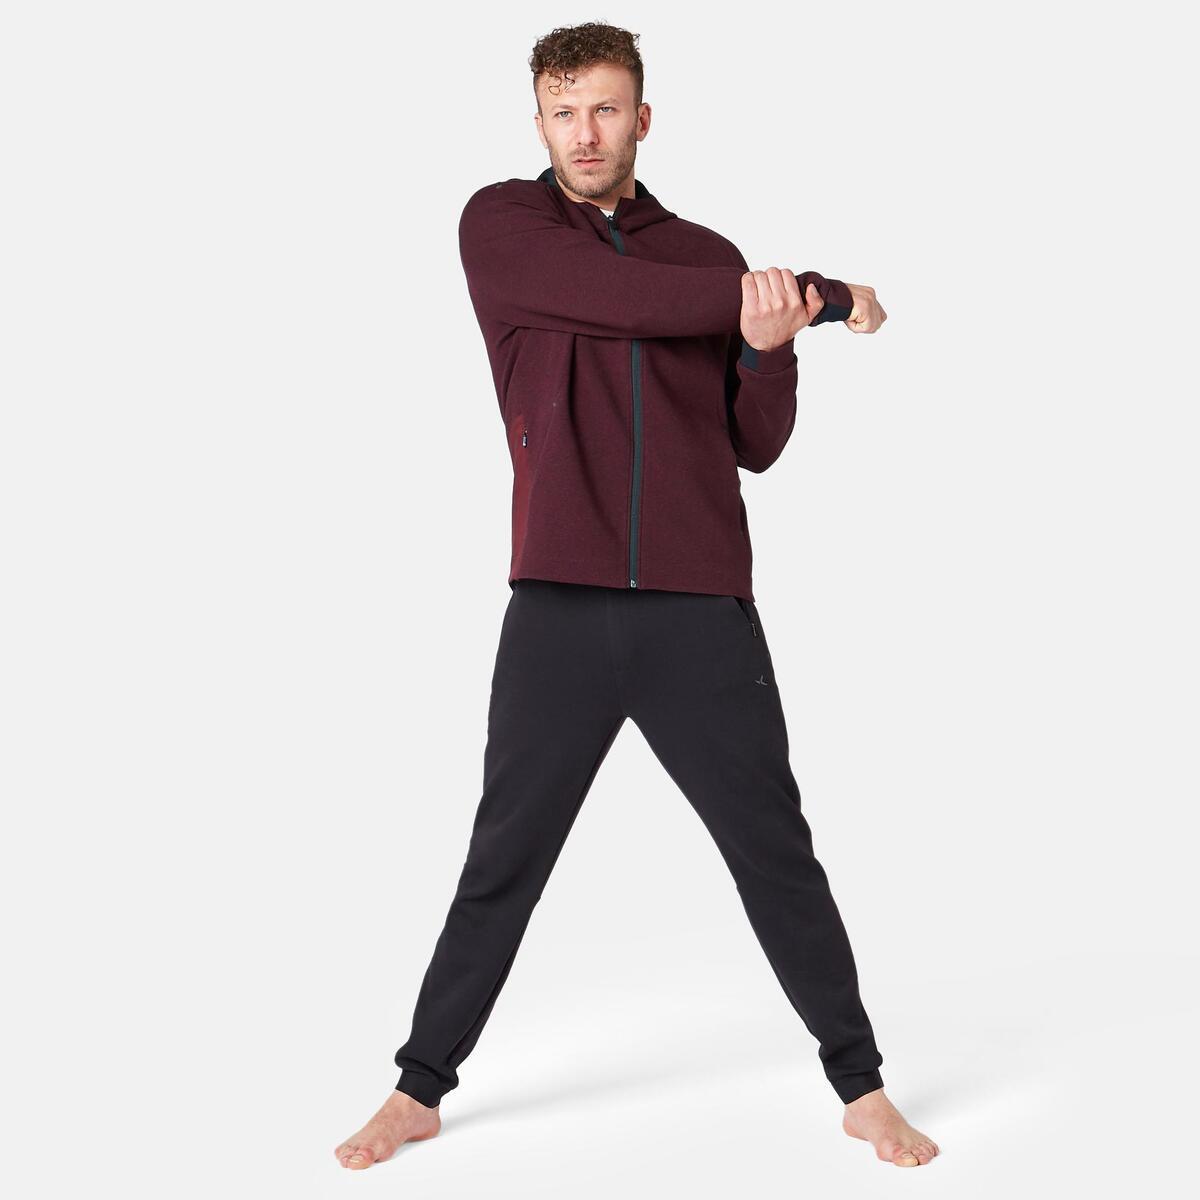 Bild 4 von Kapuzenjacke 530 Spacer Pilates sanfte Gymnastik Herren bordeauxmeliert